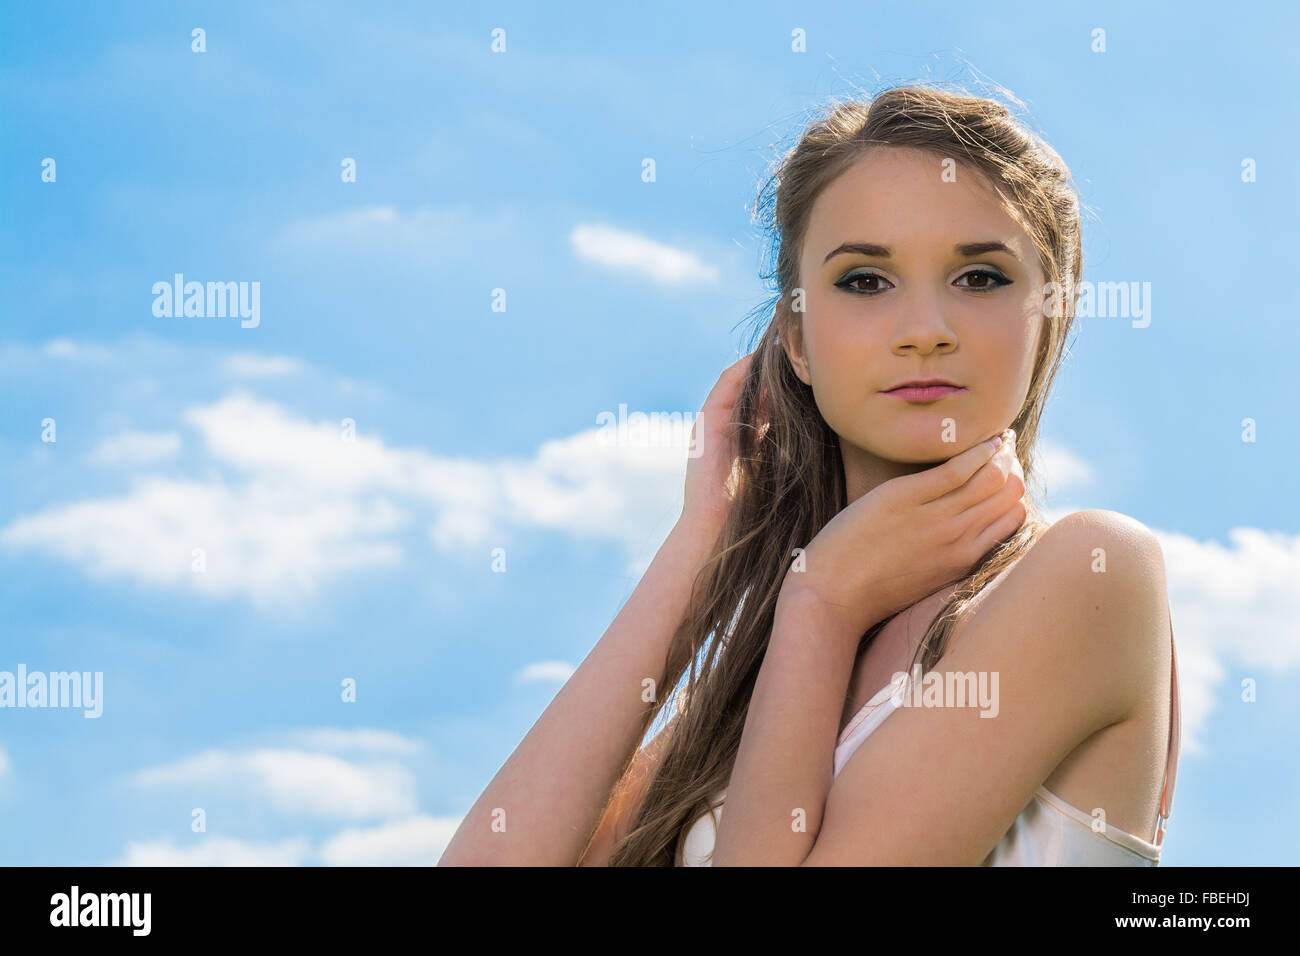 Niedrigen Winkel Ansicht Porträt der schönen jungen Frau posiert im freien gegen Himmel Stockbild